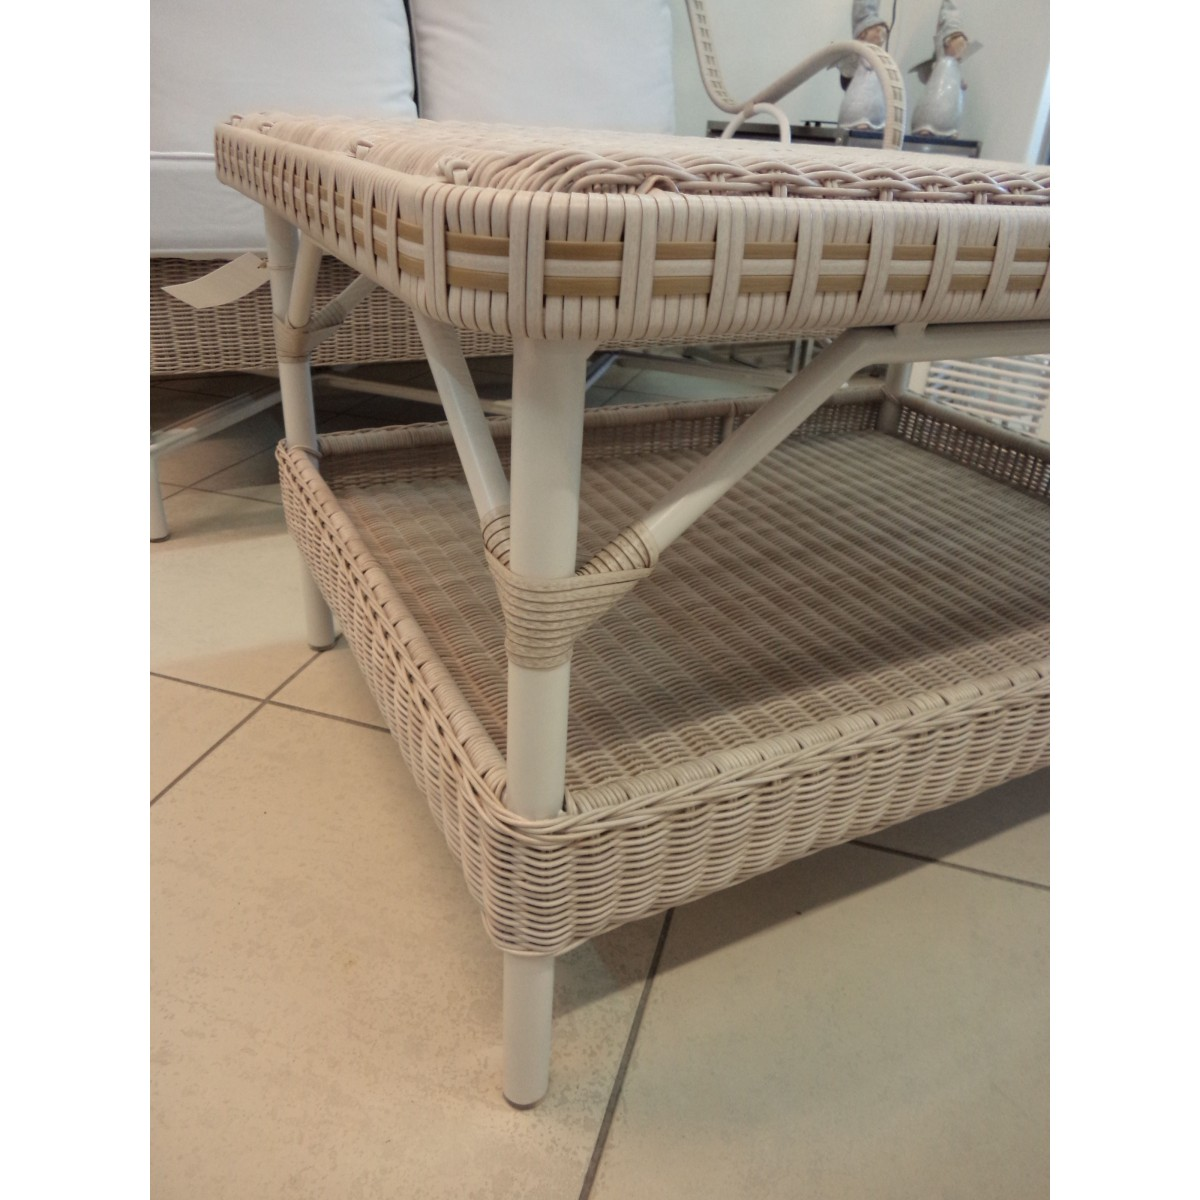 Table basse rectangulaire nantucket en r sine et aluminium - Table basse en resine ...